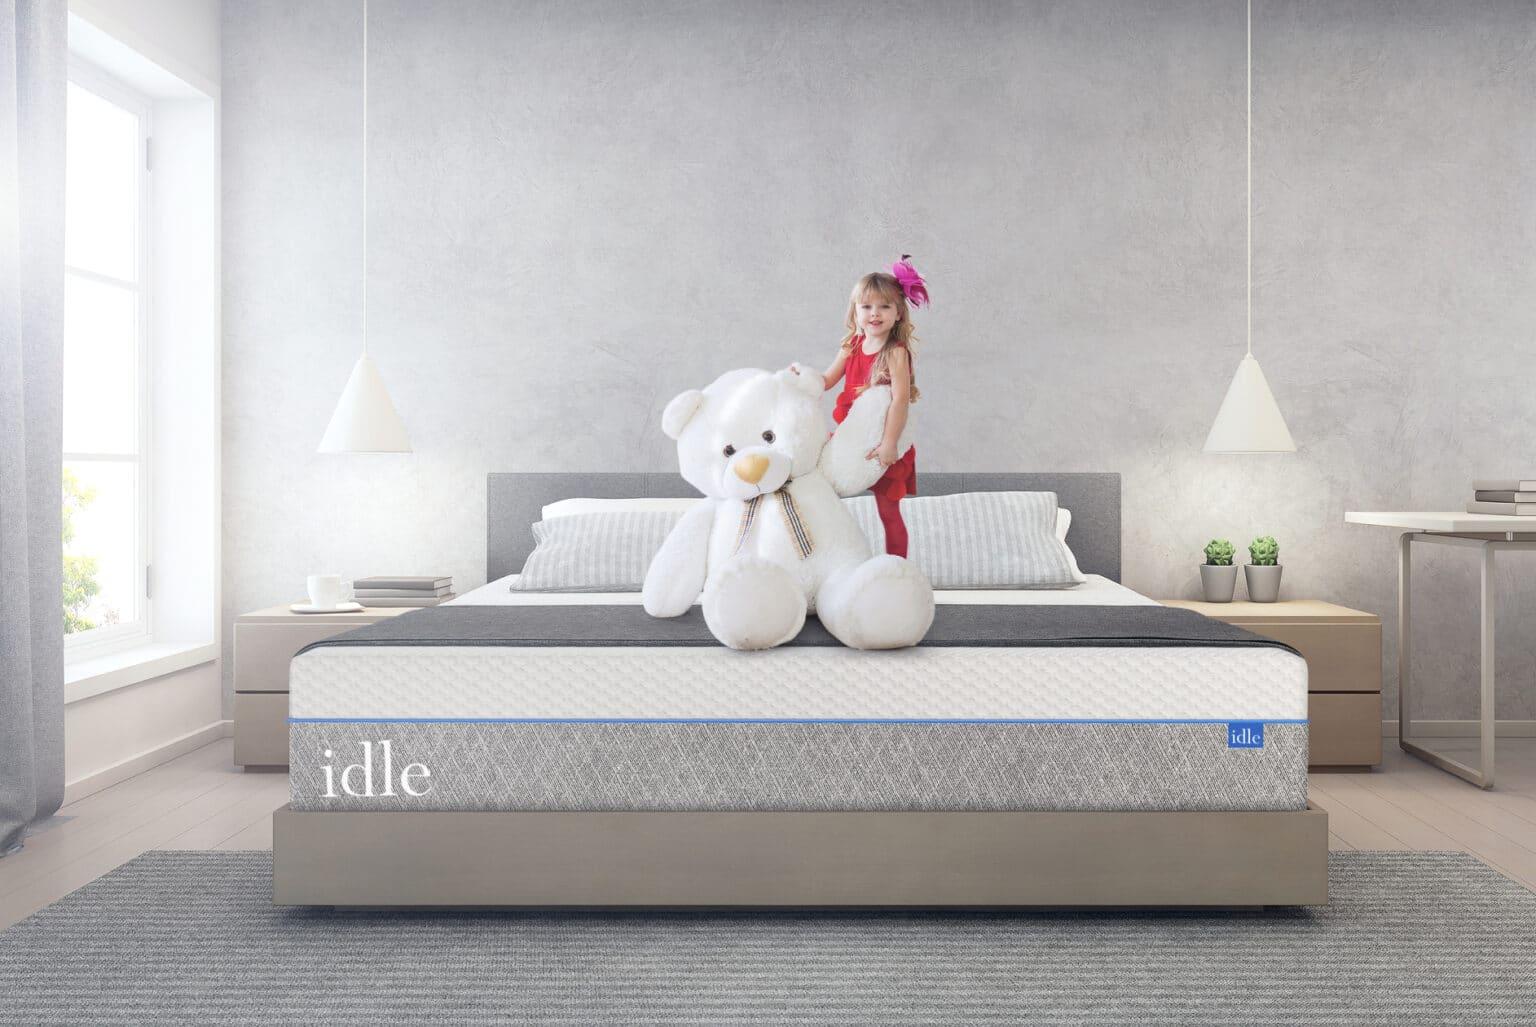 idle sleep gel all foam bed